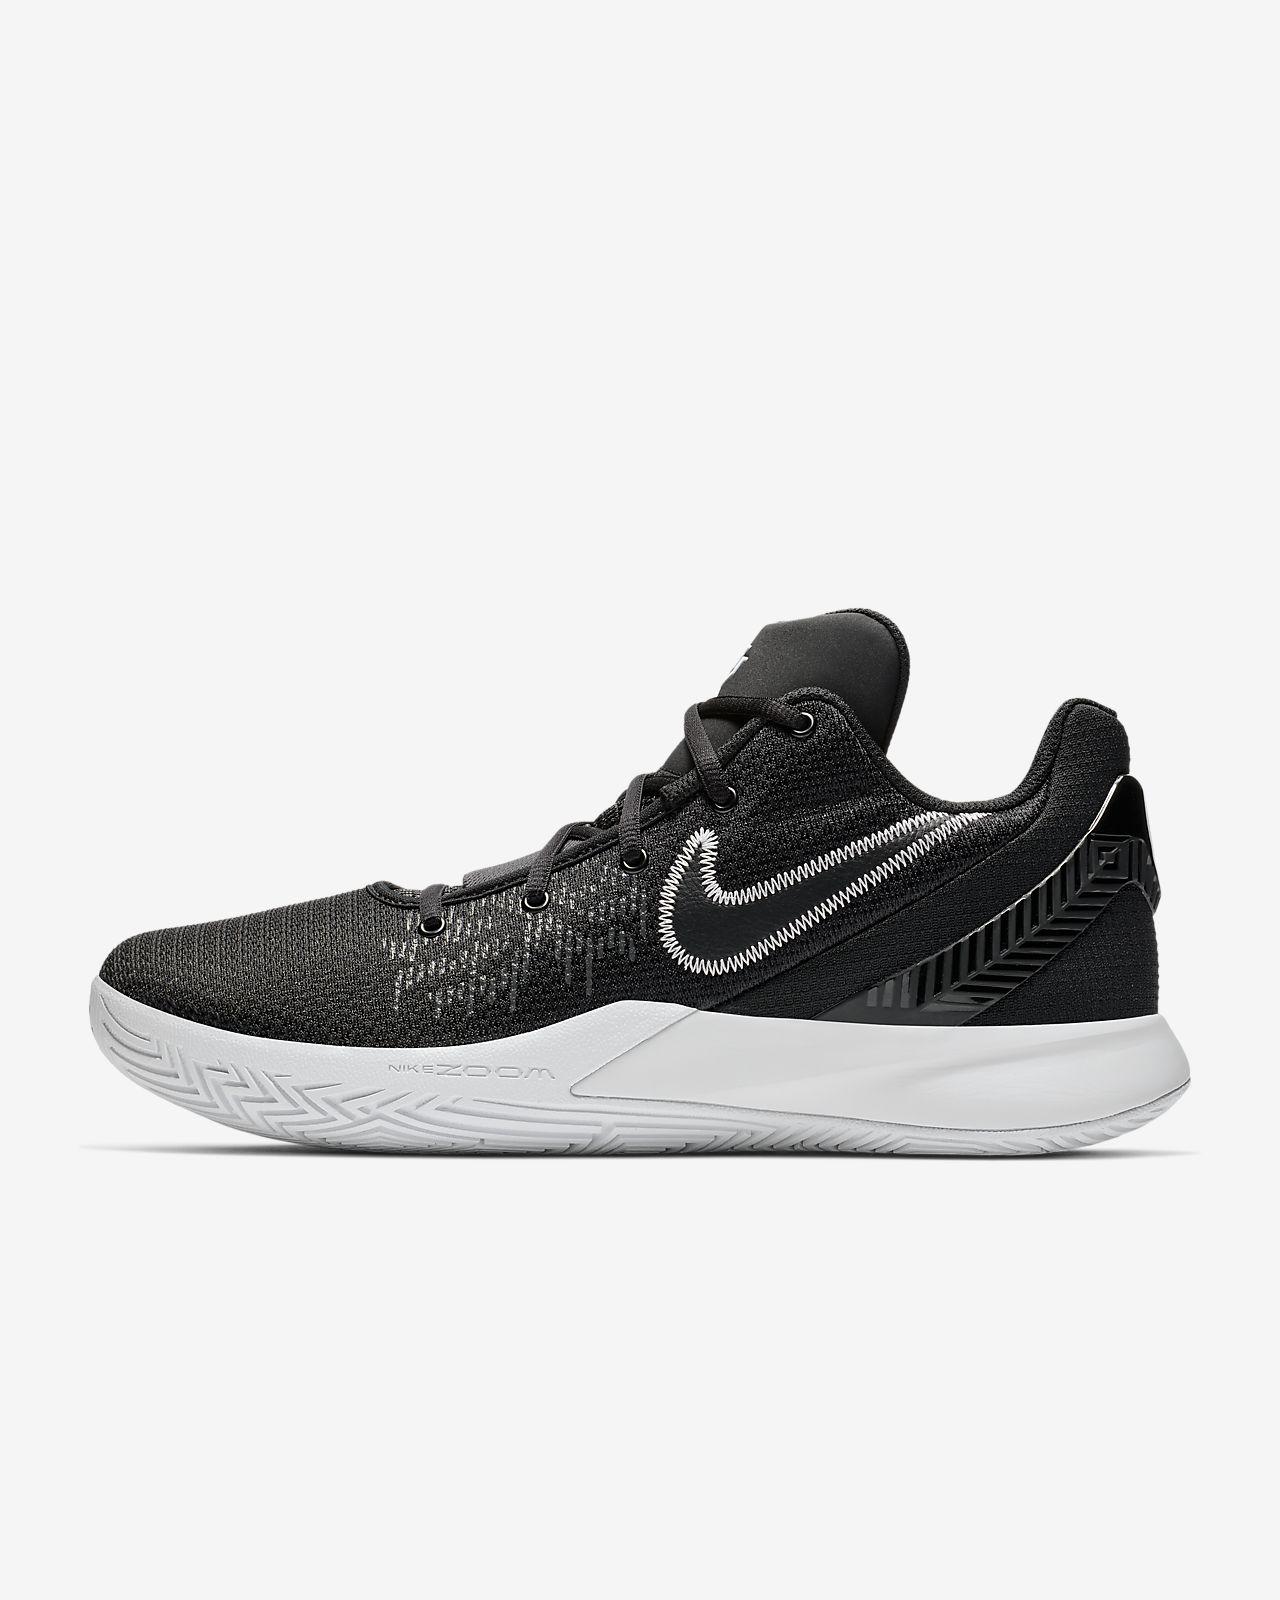 Kyrie Flytrap II EP Basketball Shoe